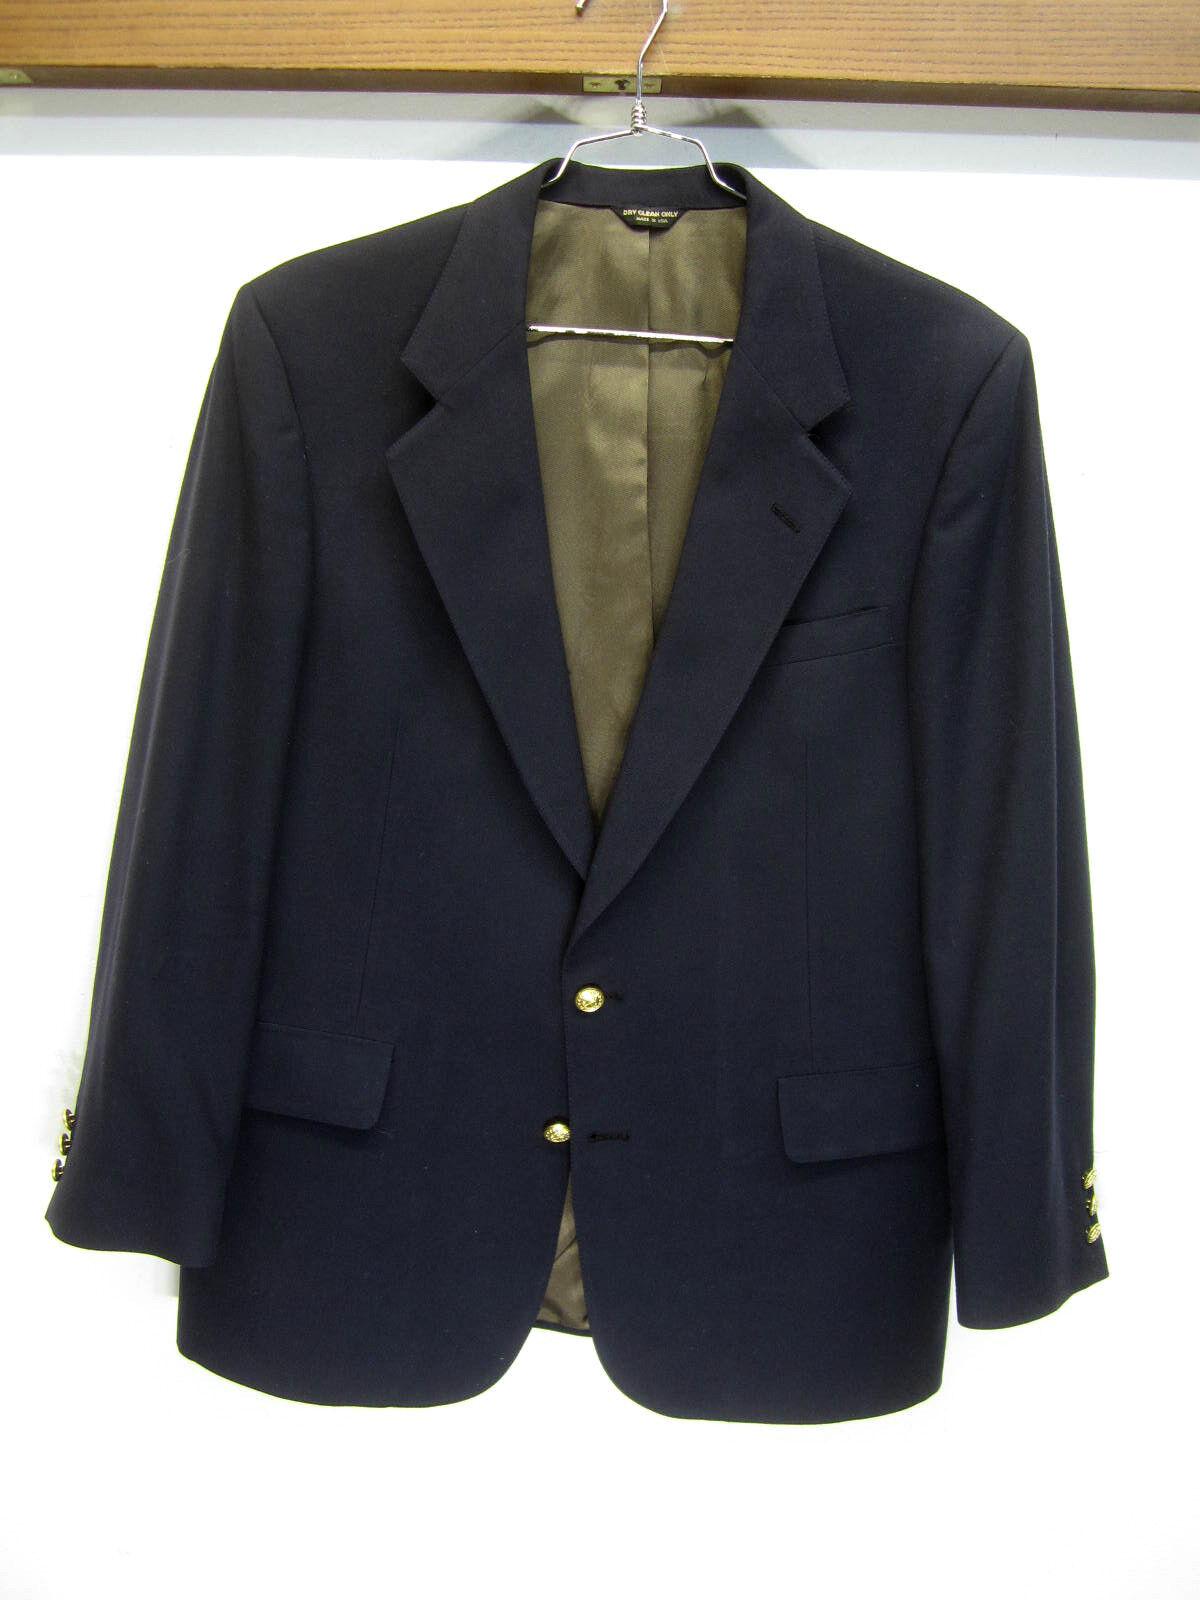 Vtg Saks Fifth Avenue Blazer Sport Coat navy 100% wool 2 btn sz 42R USA made EUC